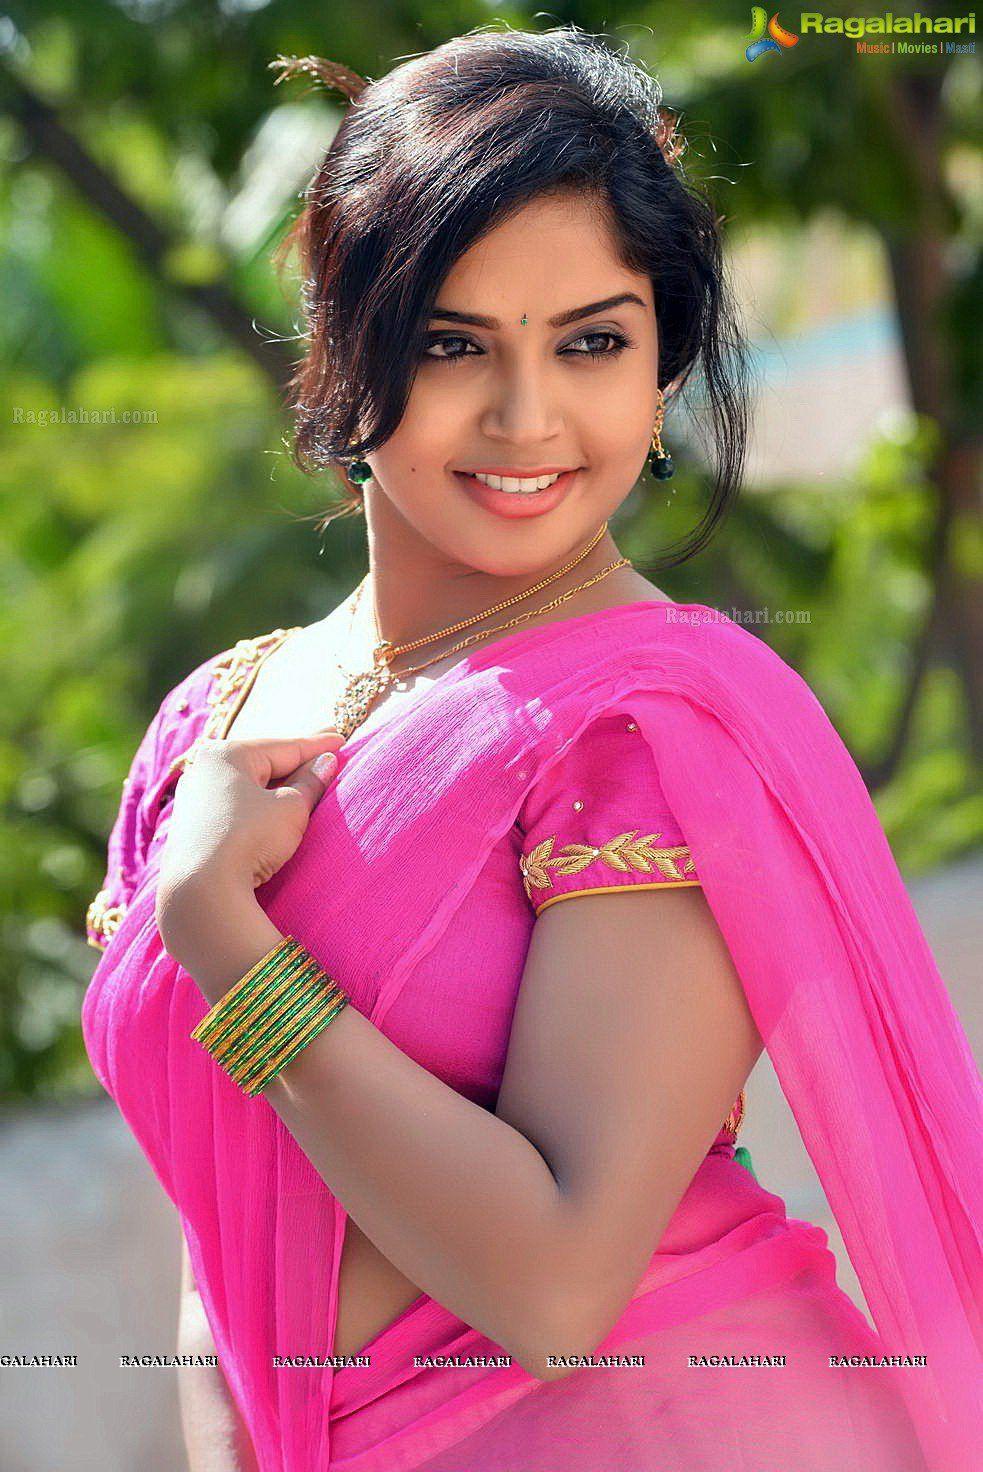 Telugu Cinema Actress Karunya Chowdary Photos - Karunya Chowdary ...